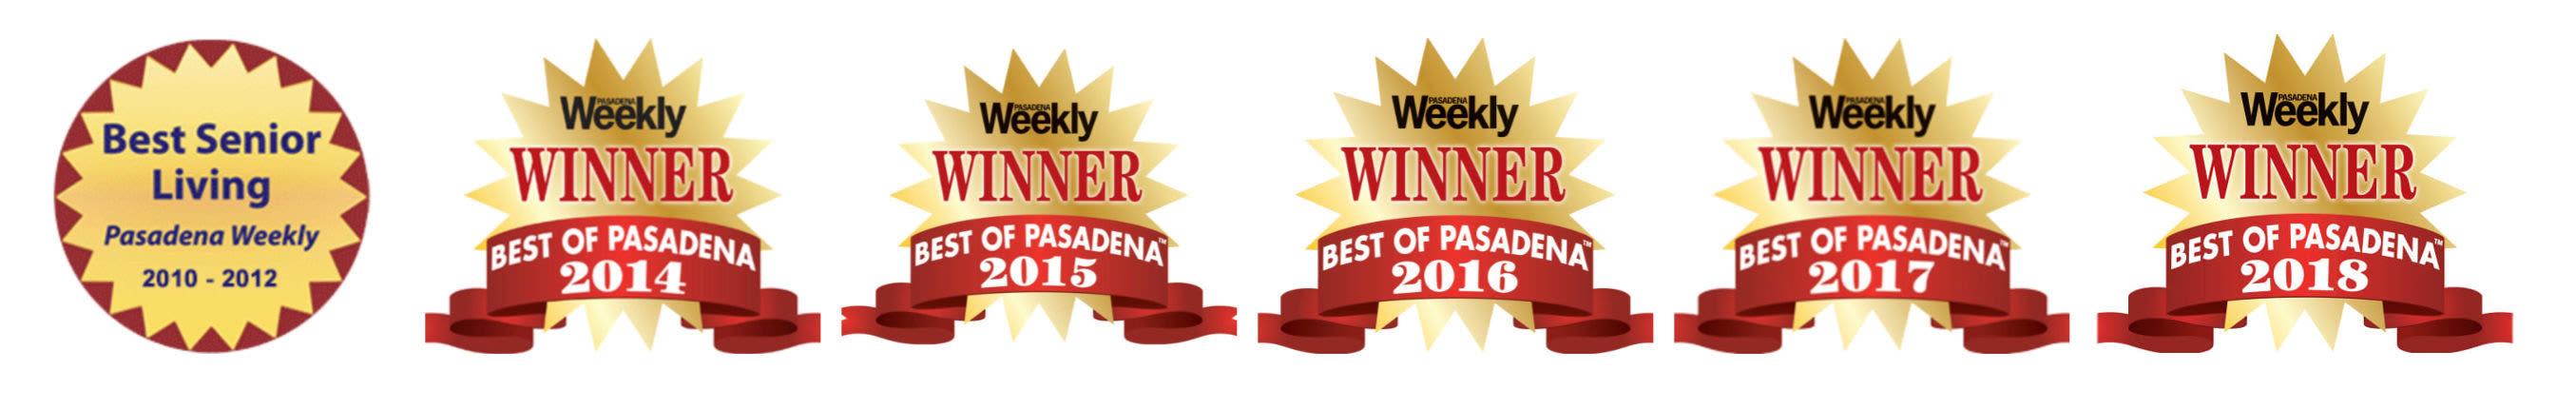 Awards won by Regency Park Senior Living, Inc. in Pasadena, California